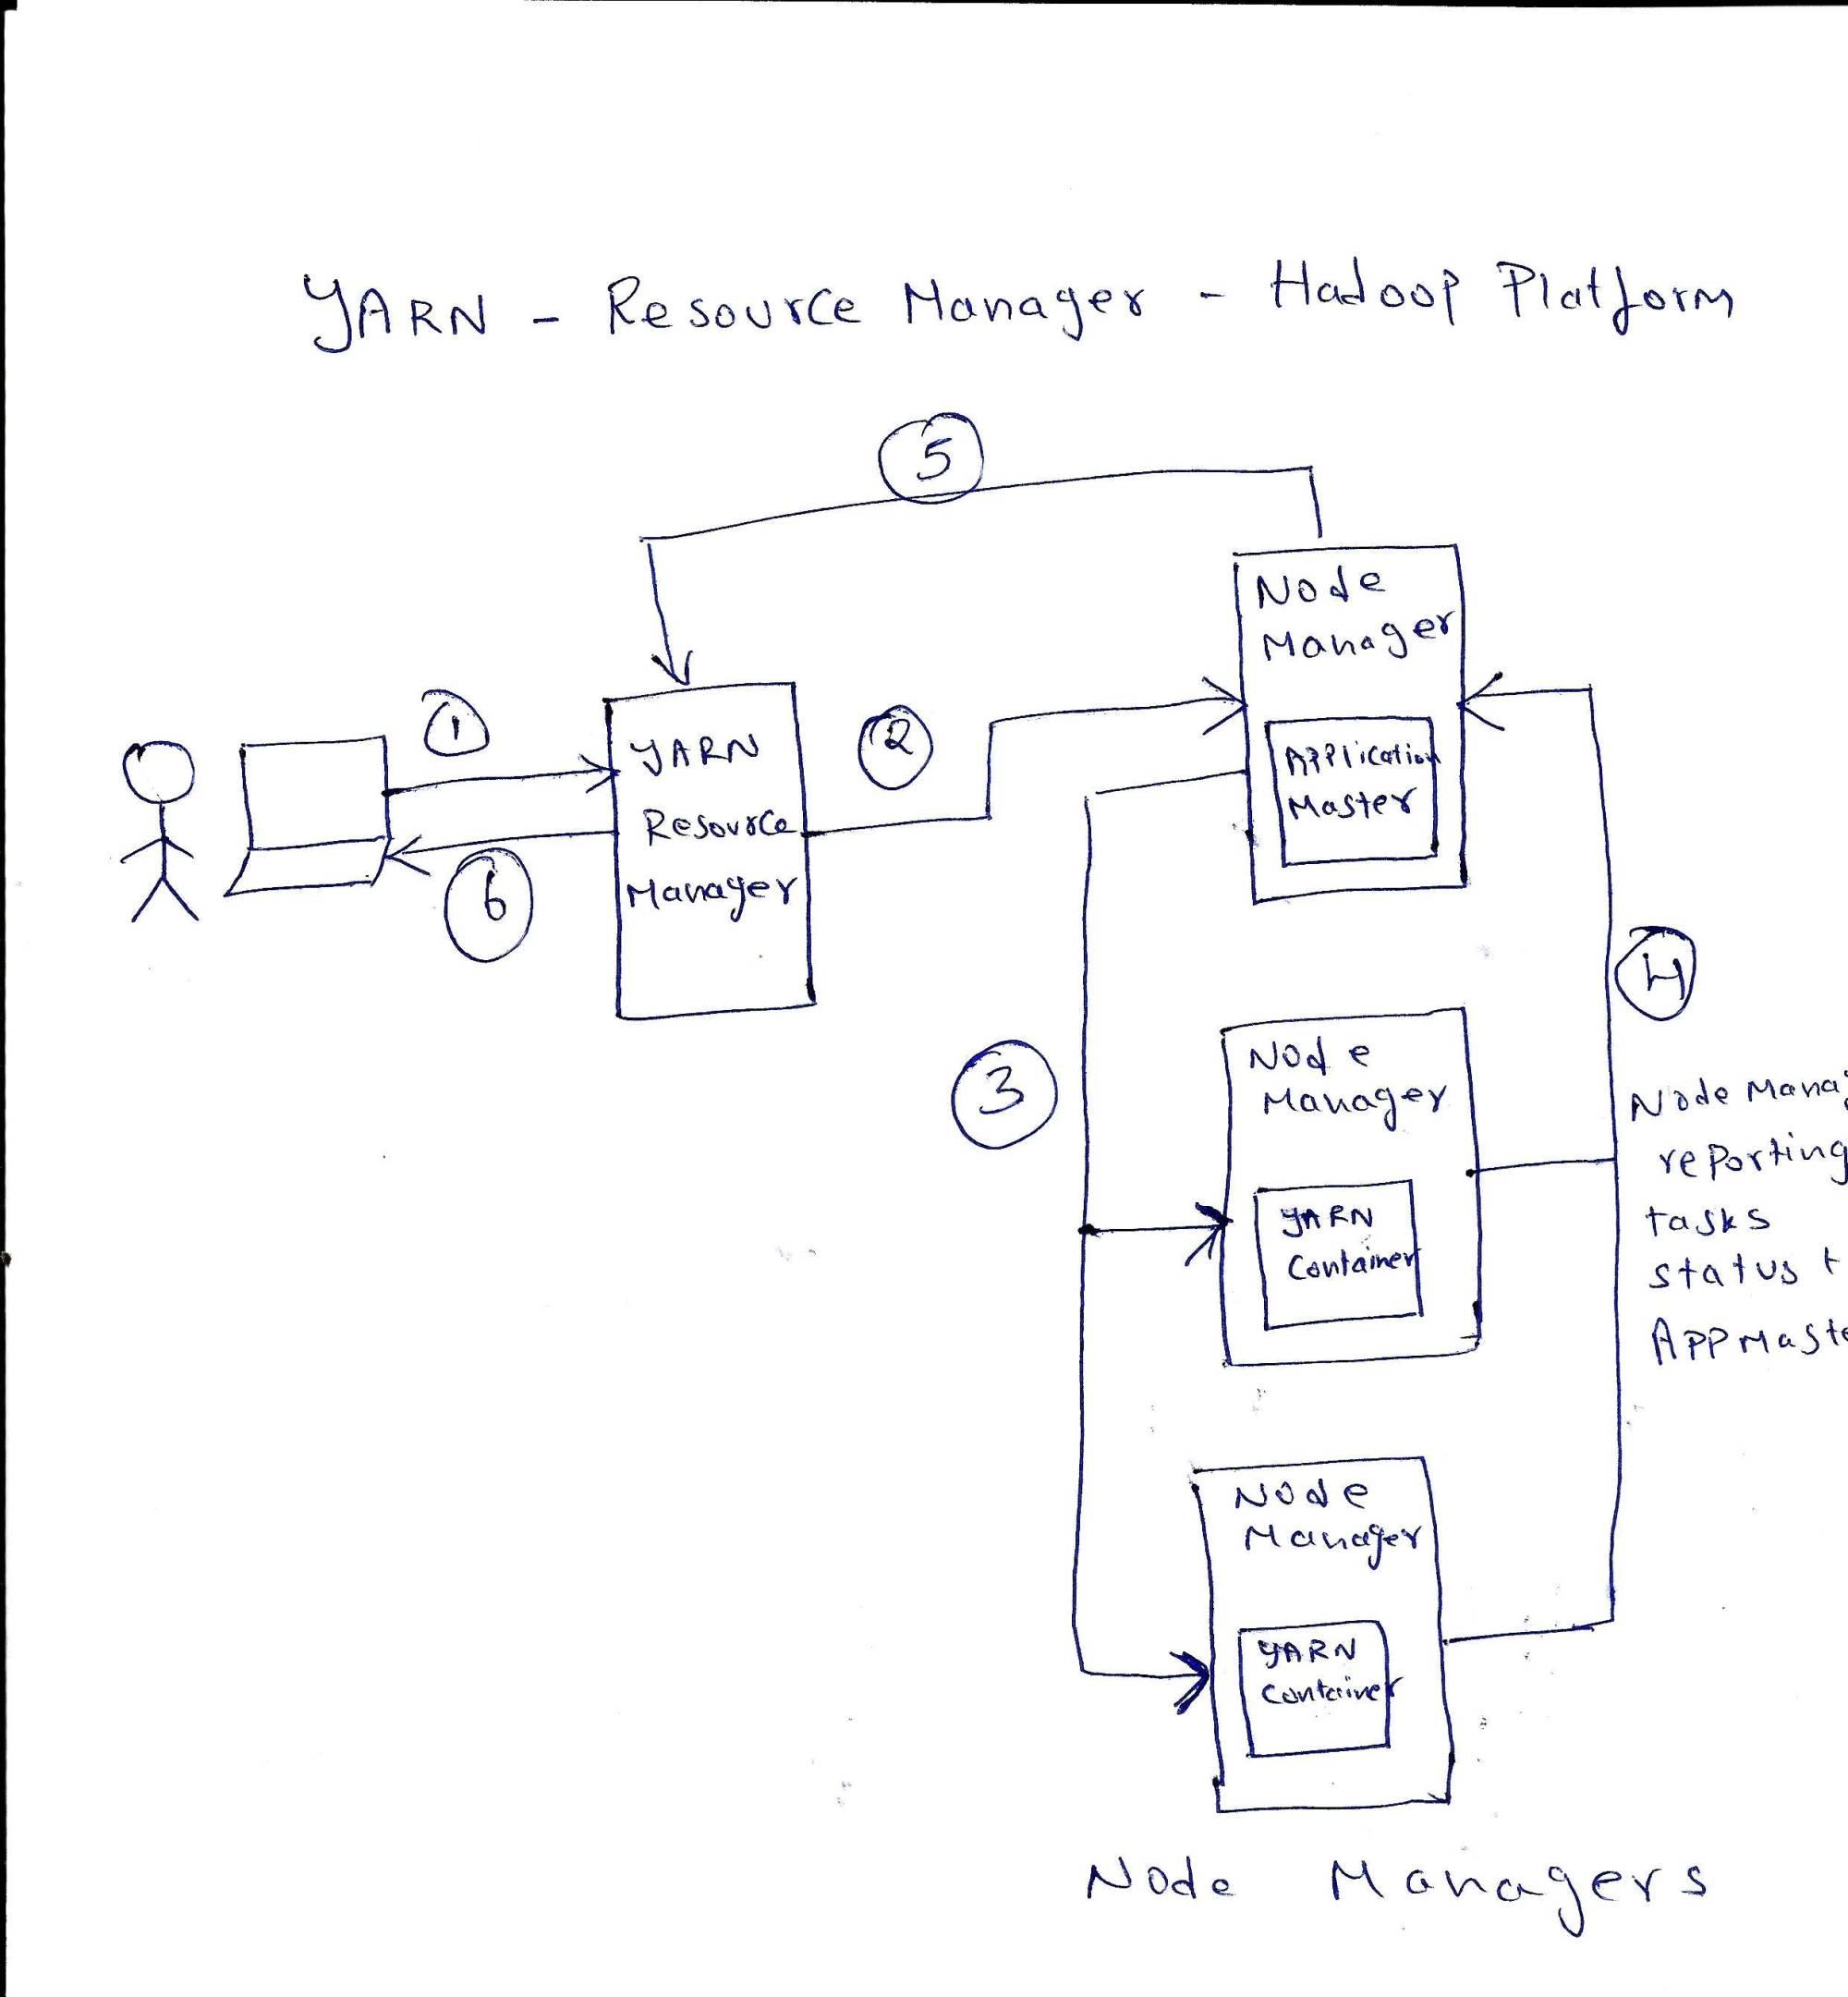 hight resolution of yarn resource scheduler cluster manager for hadoop platform in a nutshell